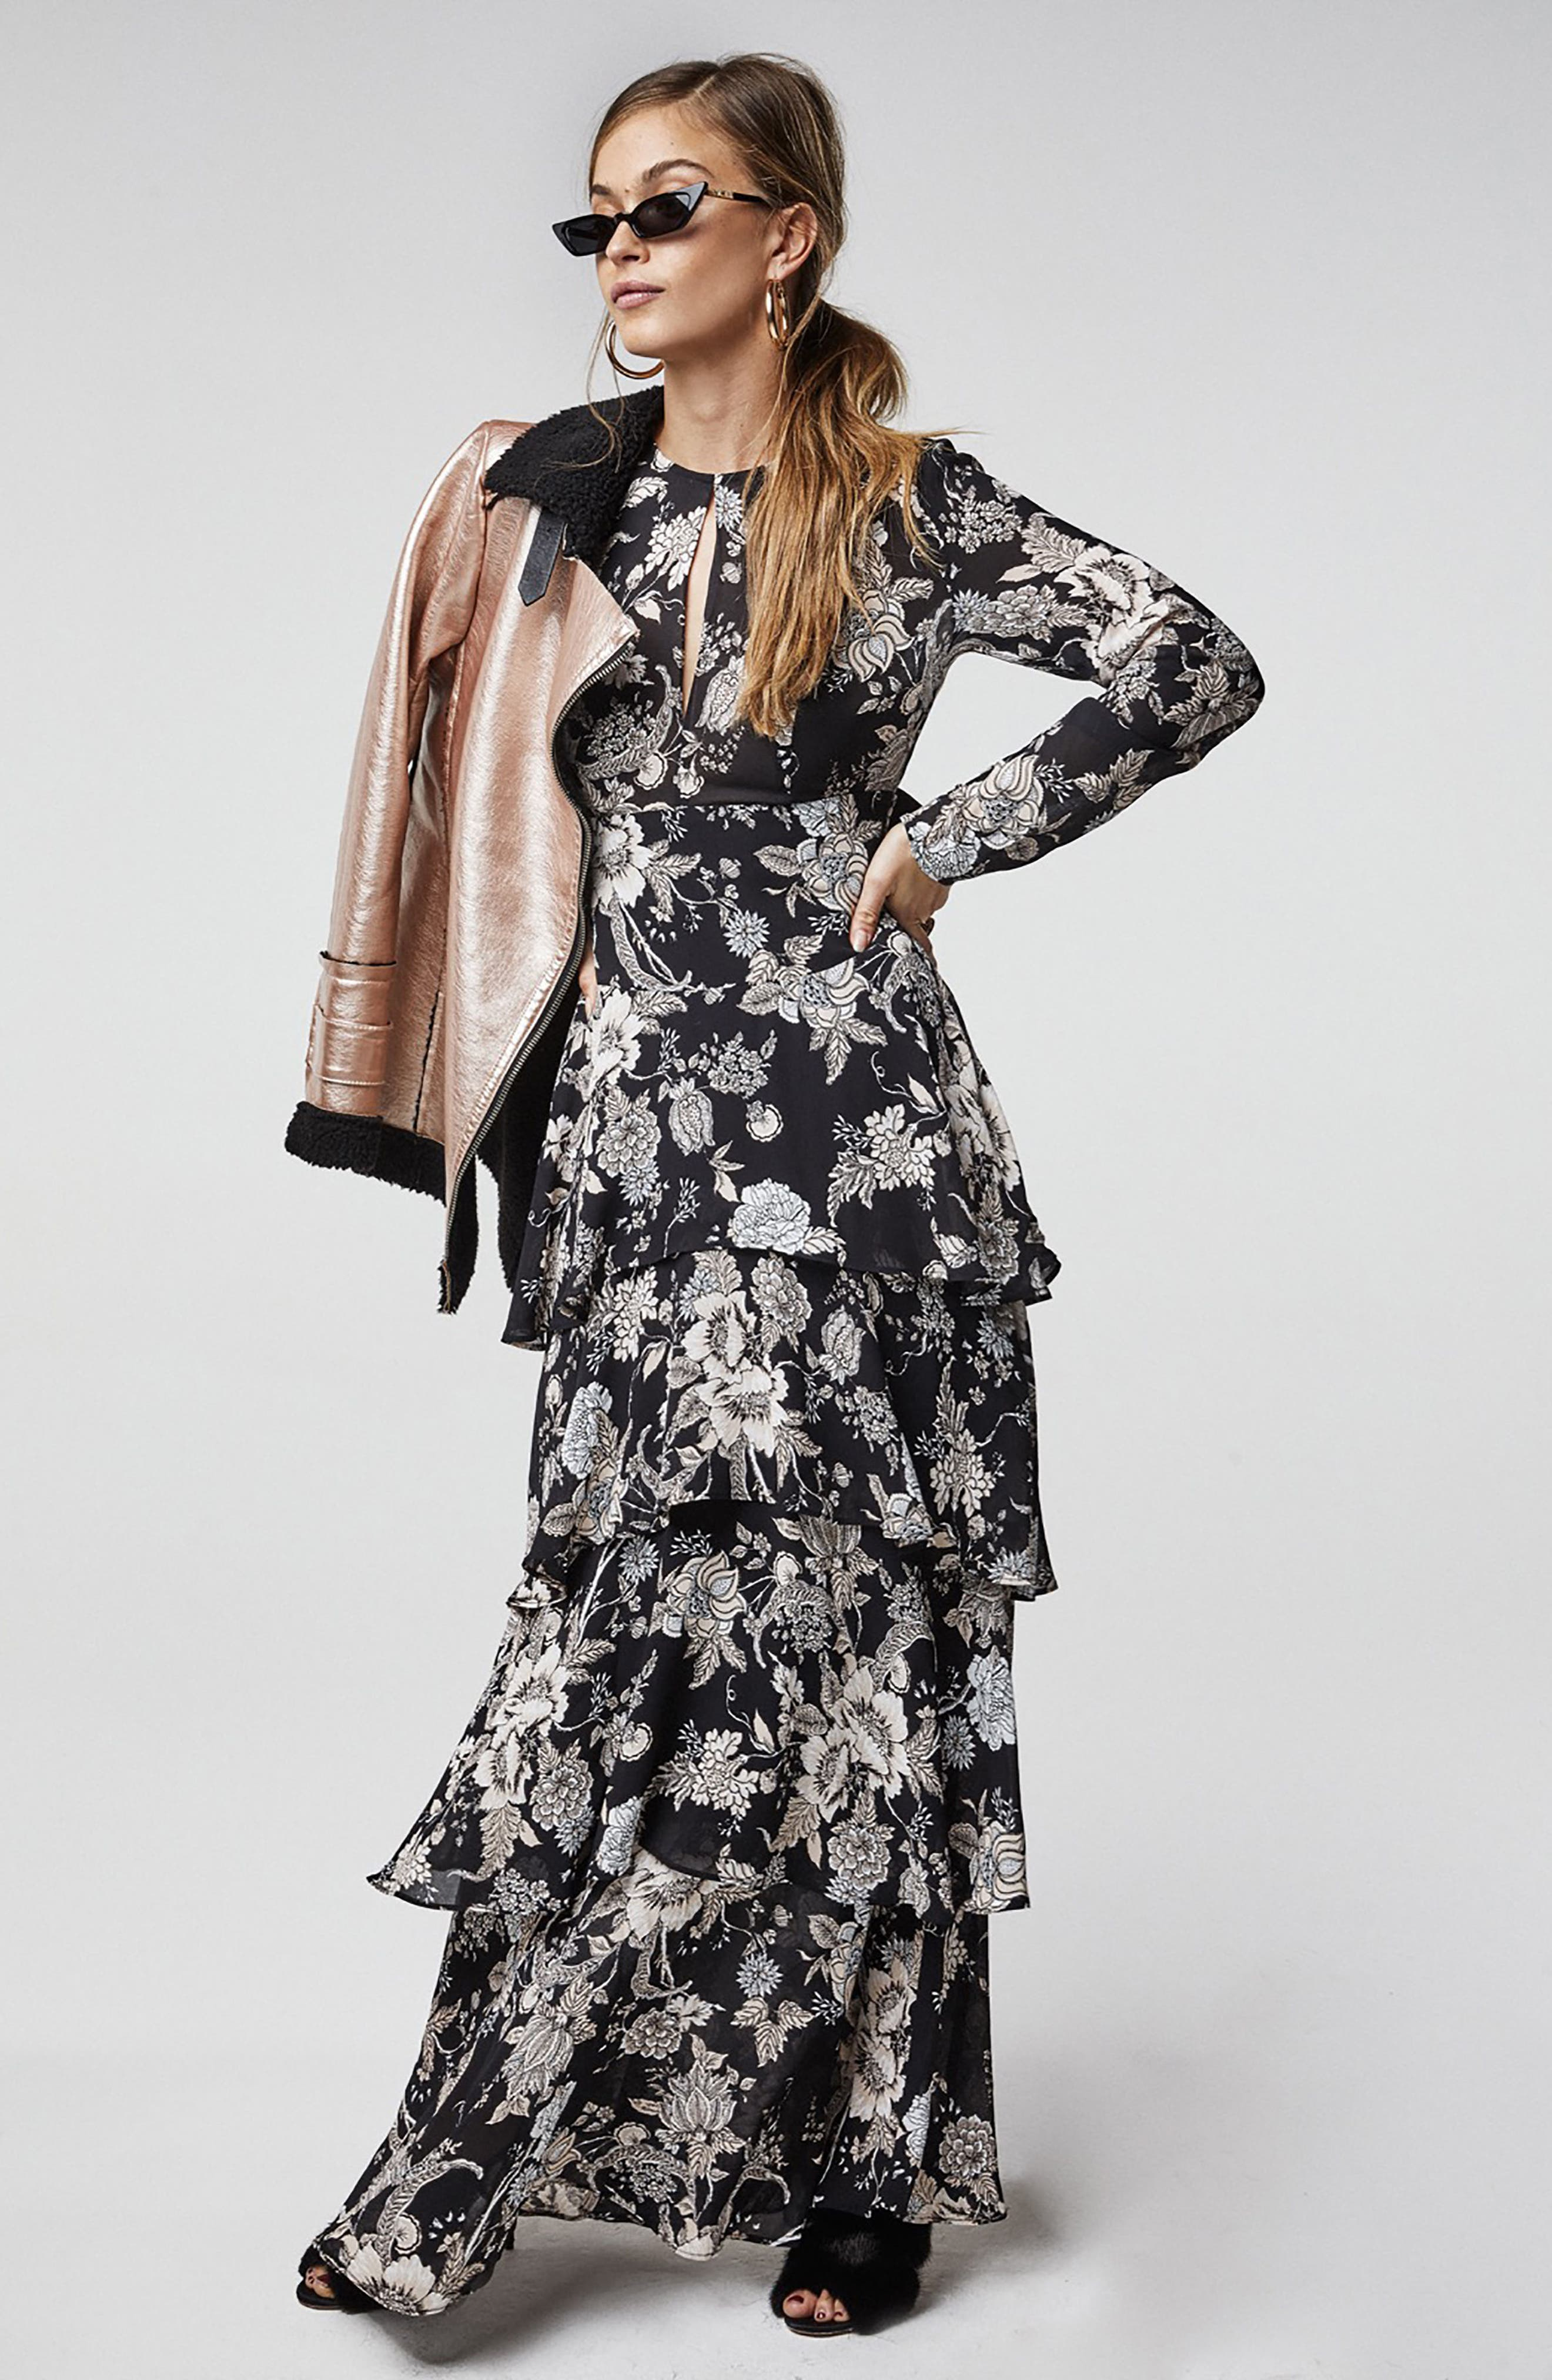 Amabella Tiered Maxi Dress,                             Alternate thumbnail 6, color,                             001